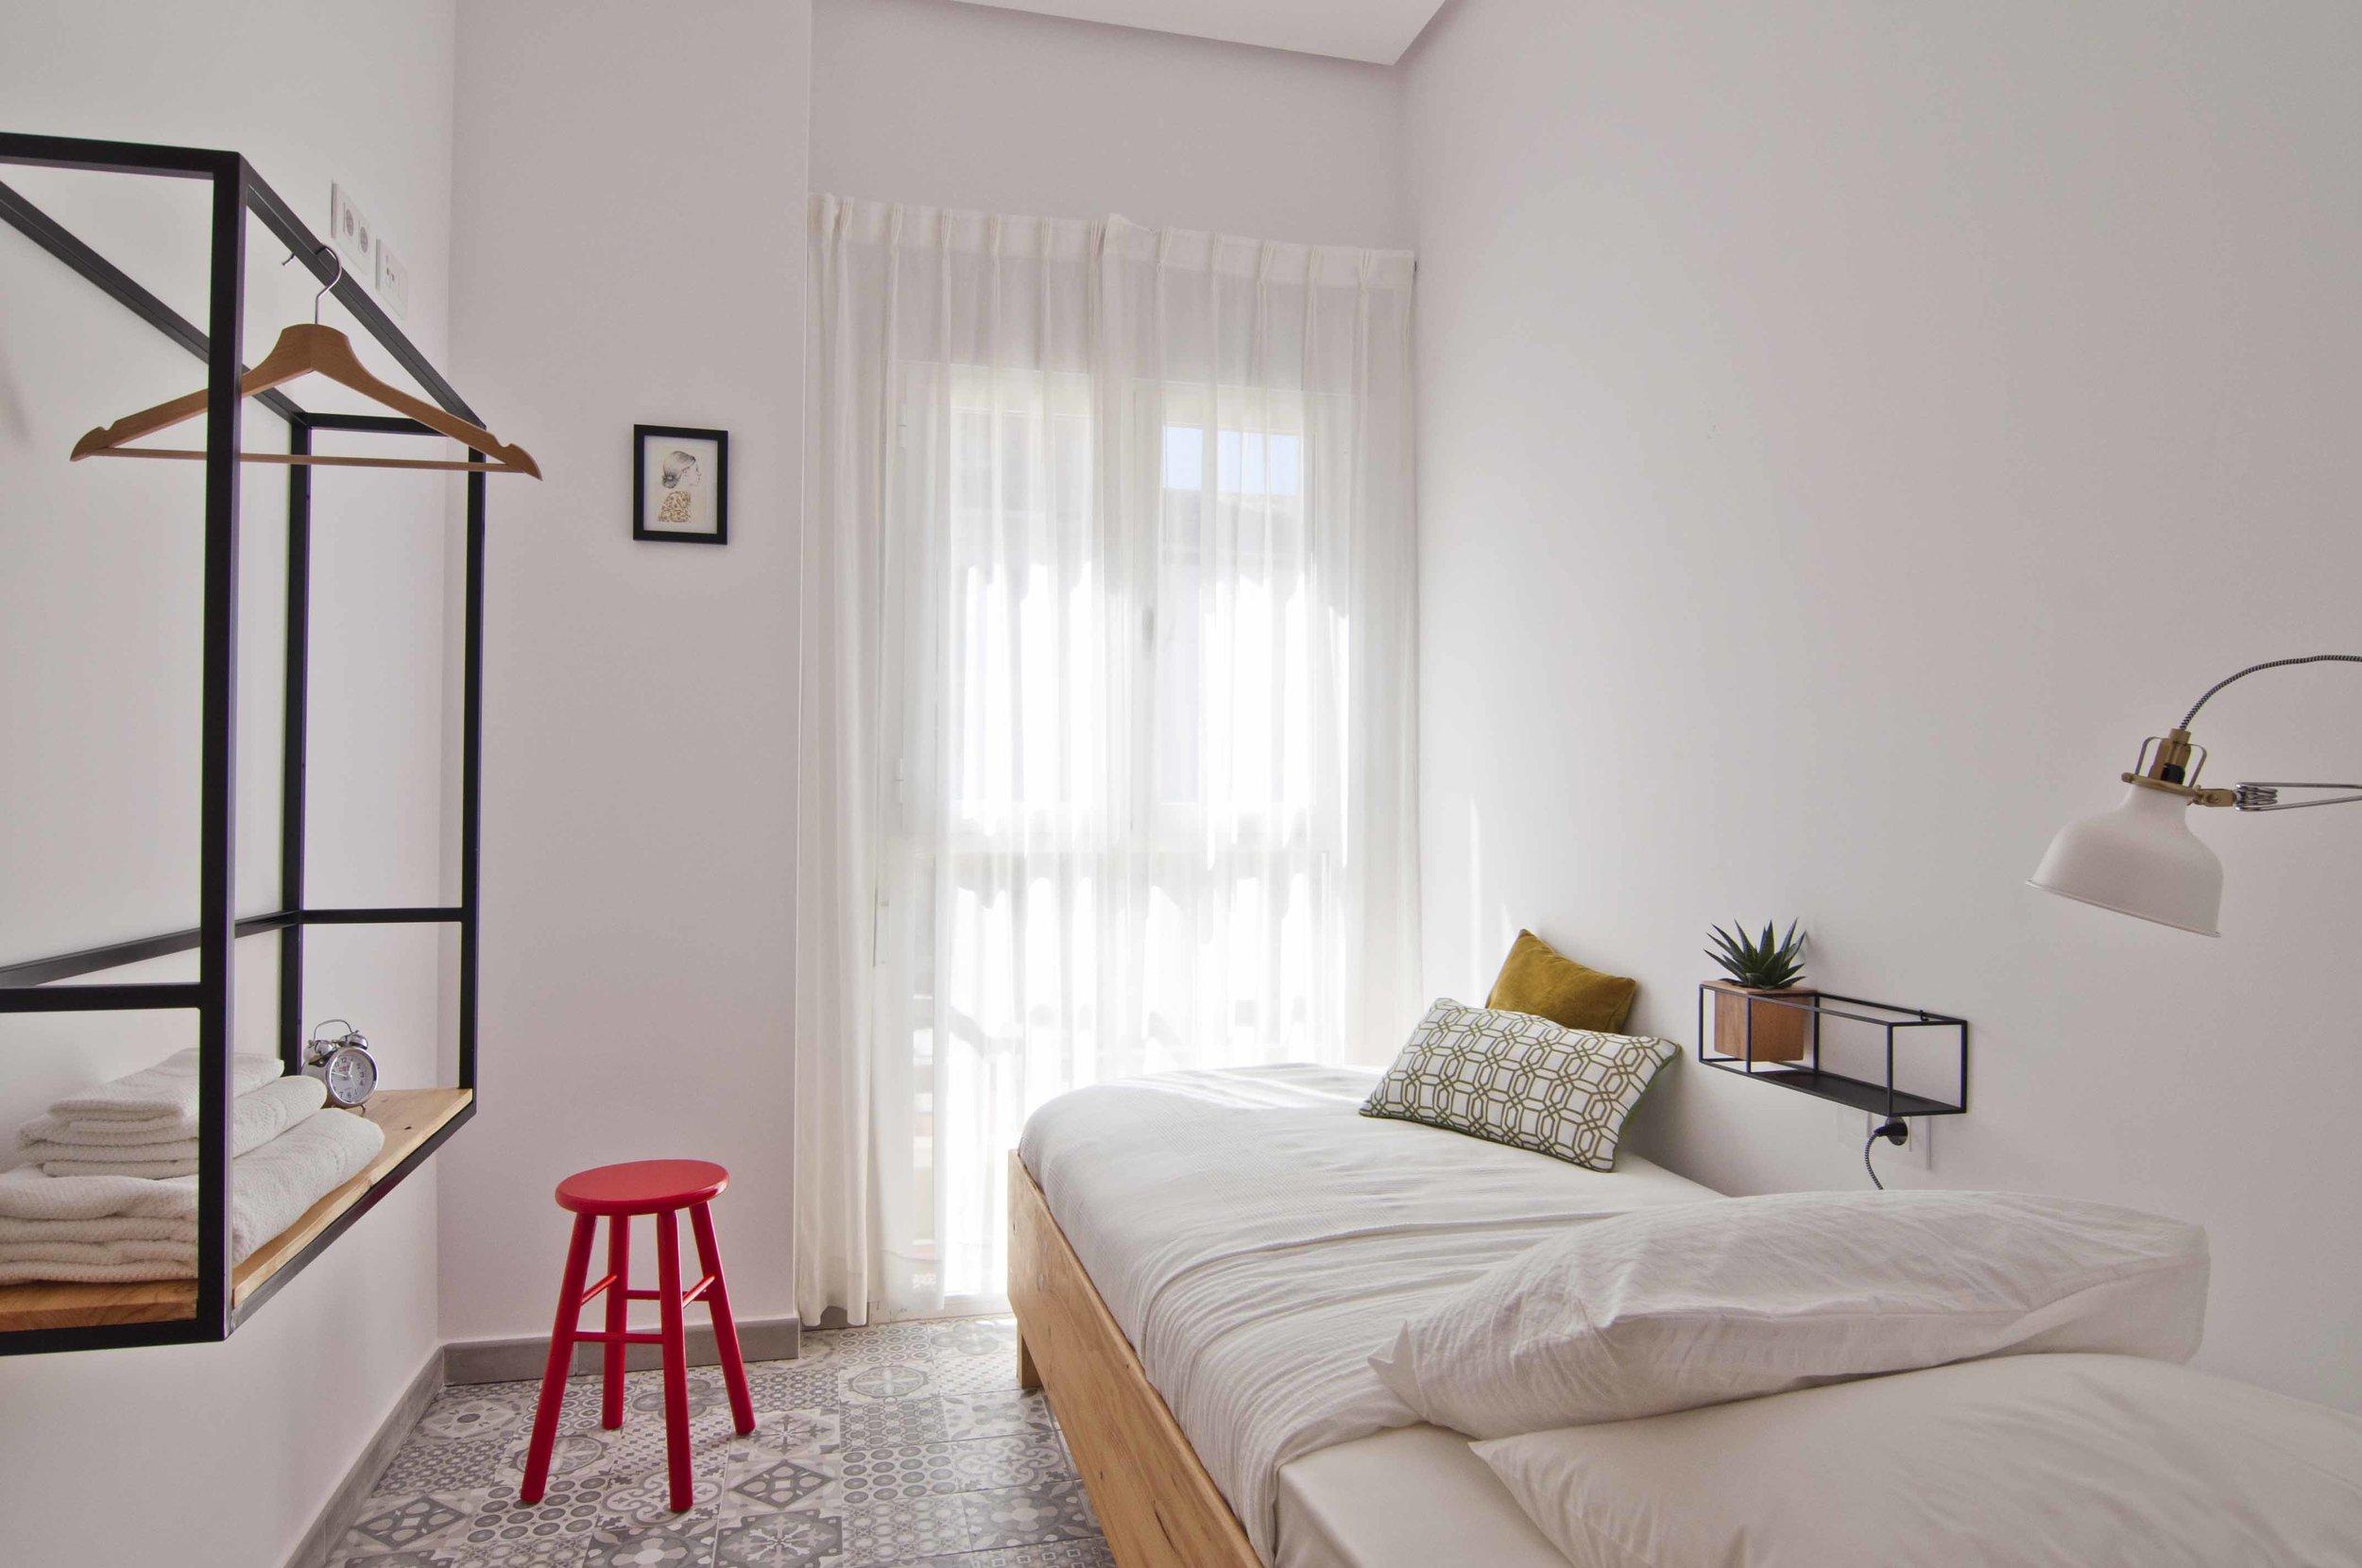 Single room at Zalamera bed and breakfast in Valencia, Spain 0323.jpg